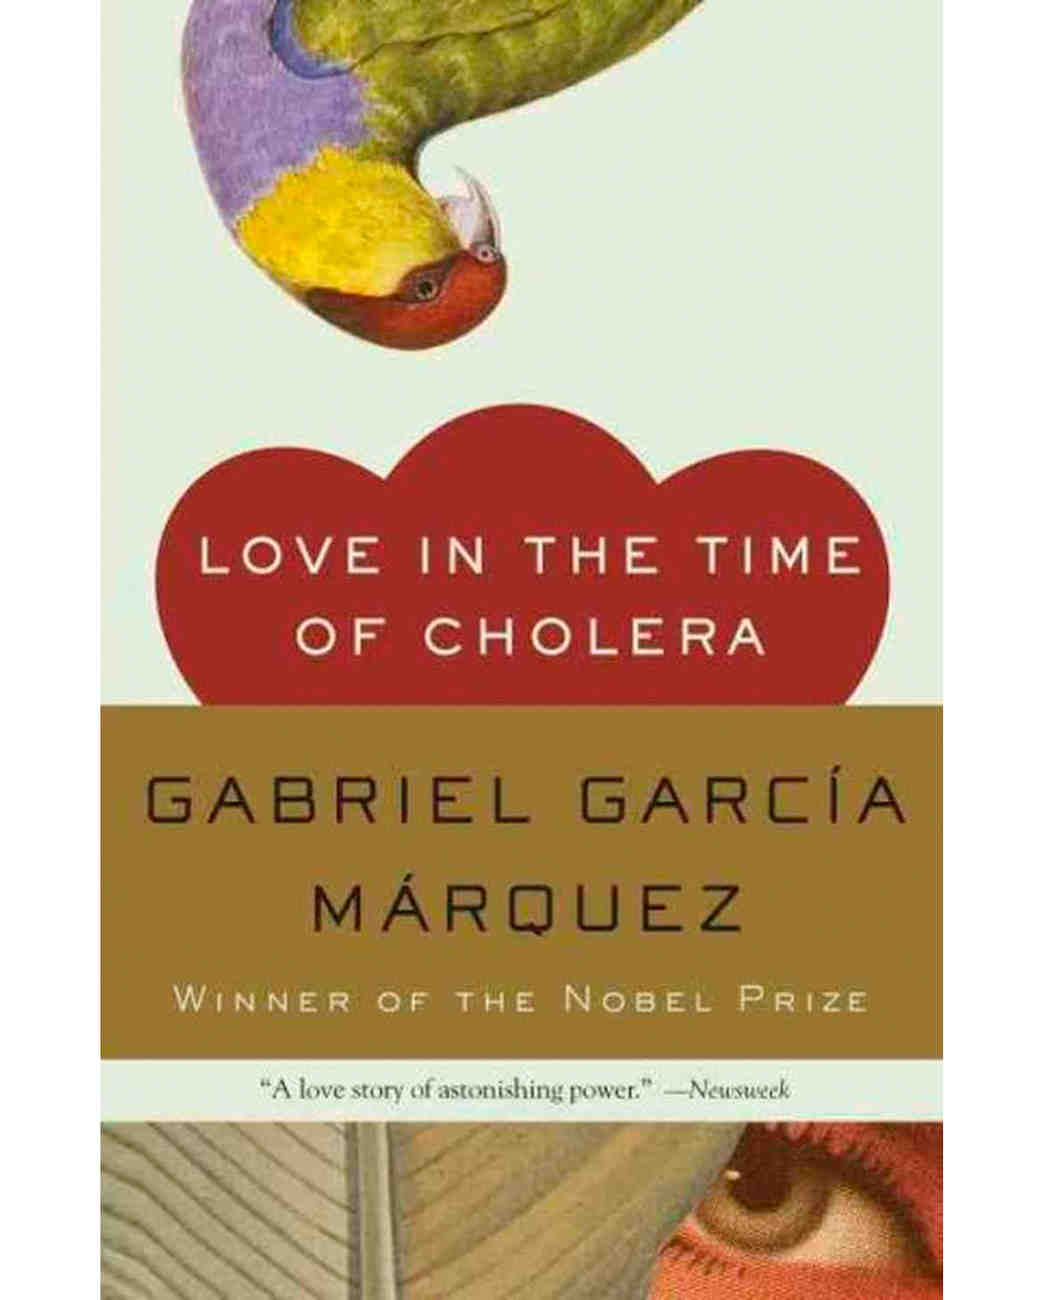 books-read-before-marriage-love-time-cholera-marquez-0115.jpg